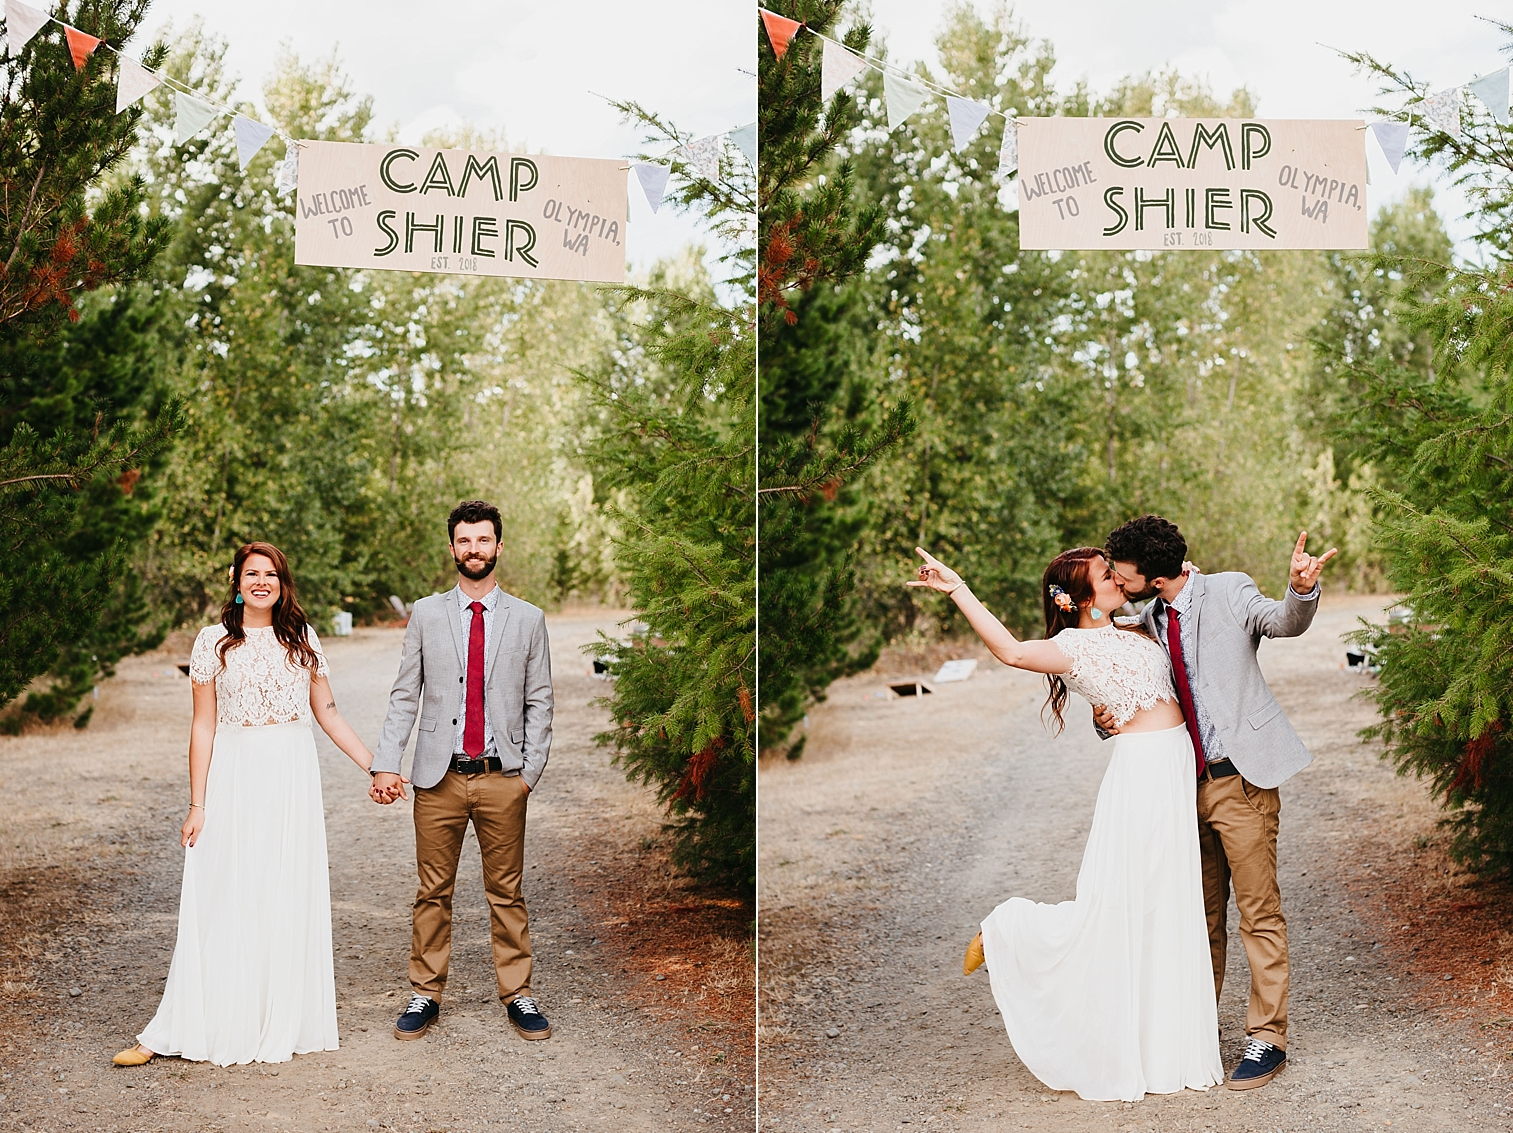 Summer-Camp-Themed-Wedding-117.jpg